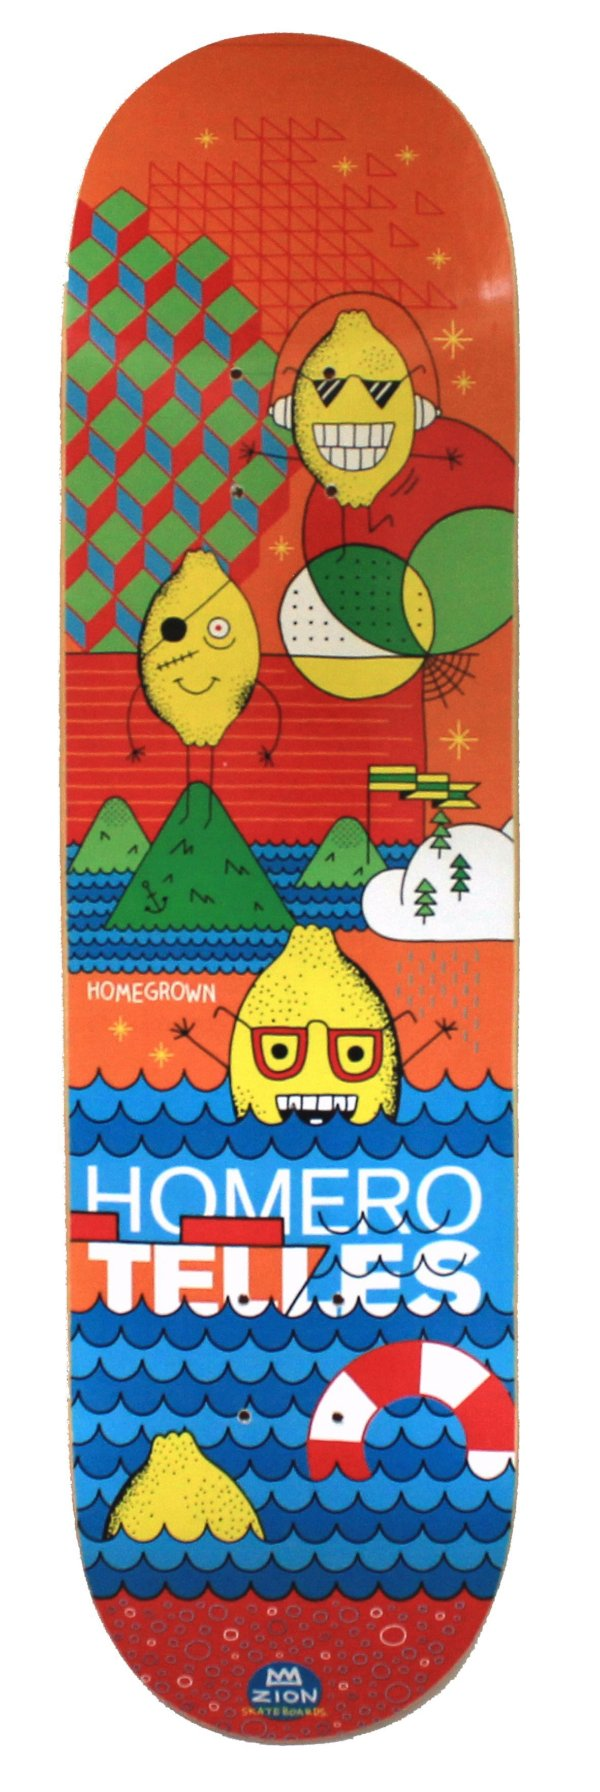 Shape Zion Pro Model Homero Telles